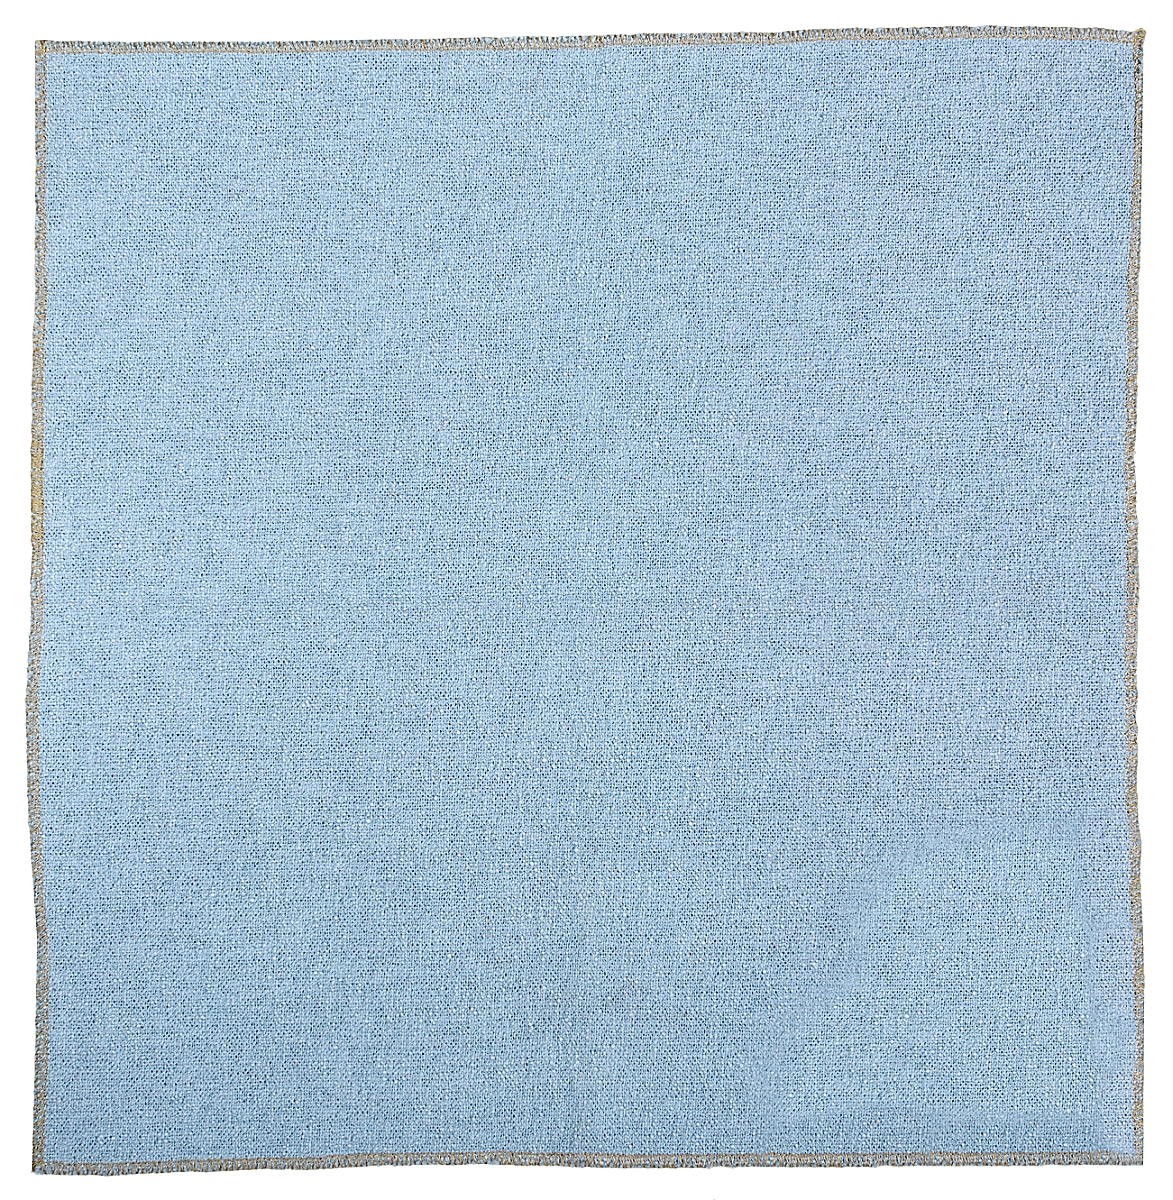 Luxe Loop: Vast Sky (fabric yardage)